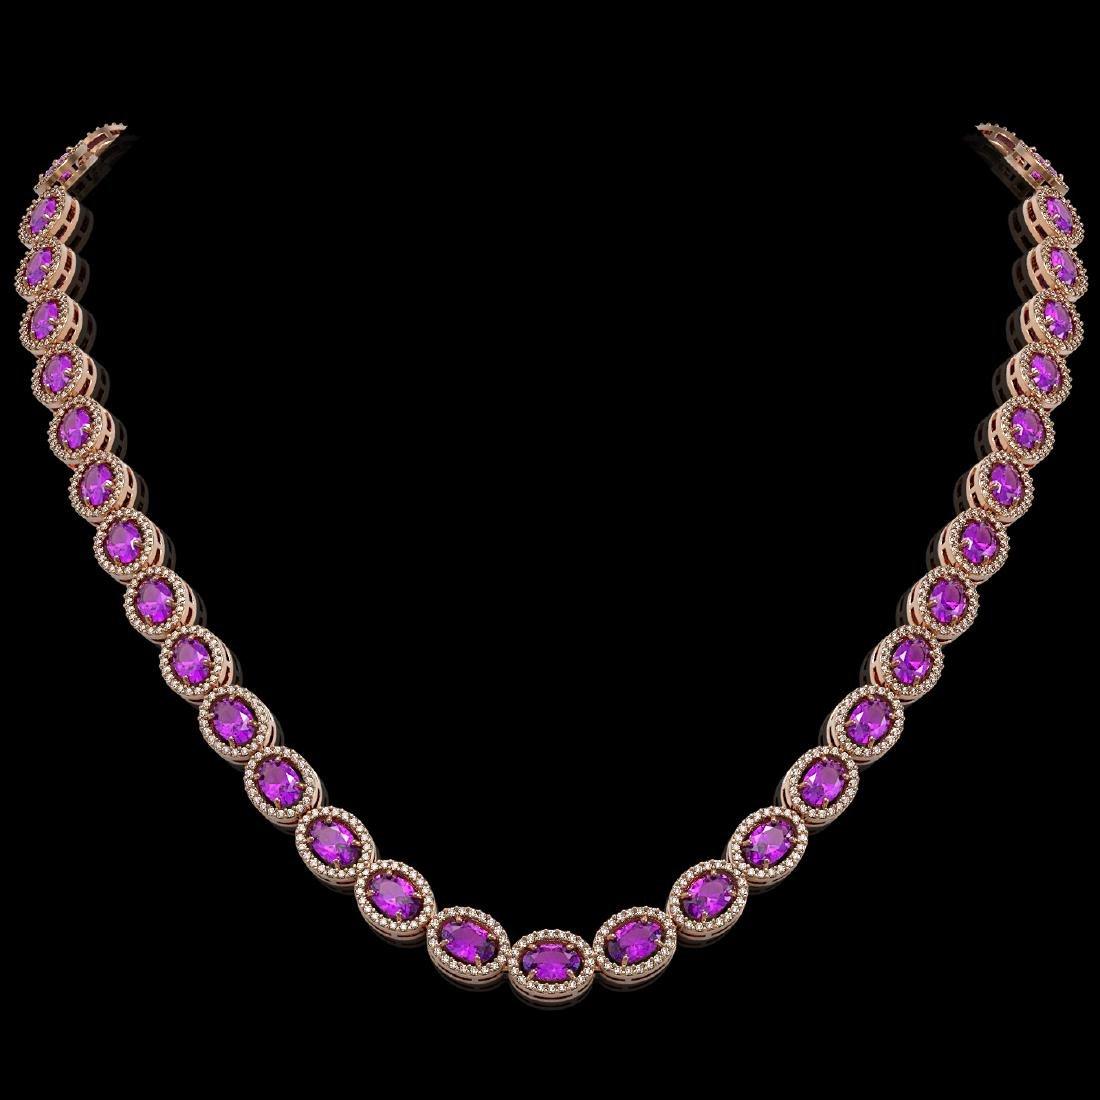 29.38 CTW Amethyst & Diamond Halo Necklace 10K Rose